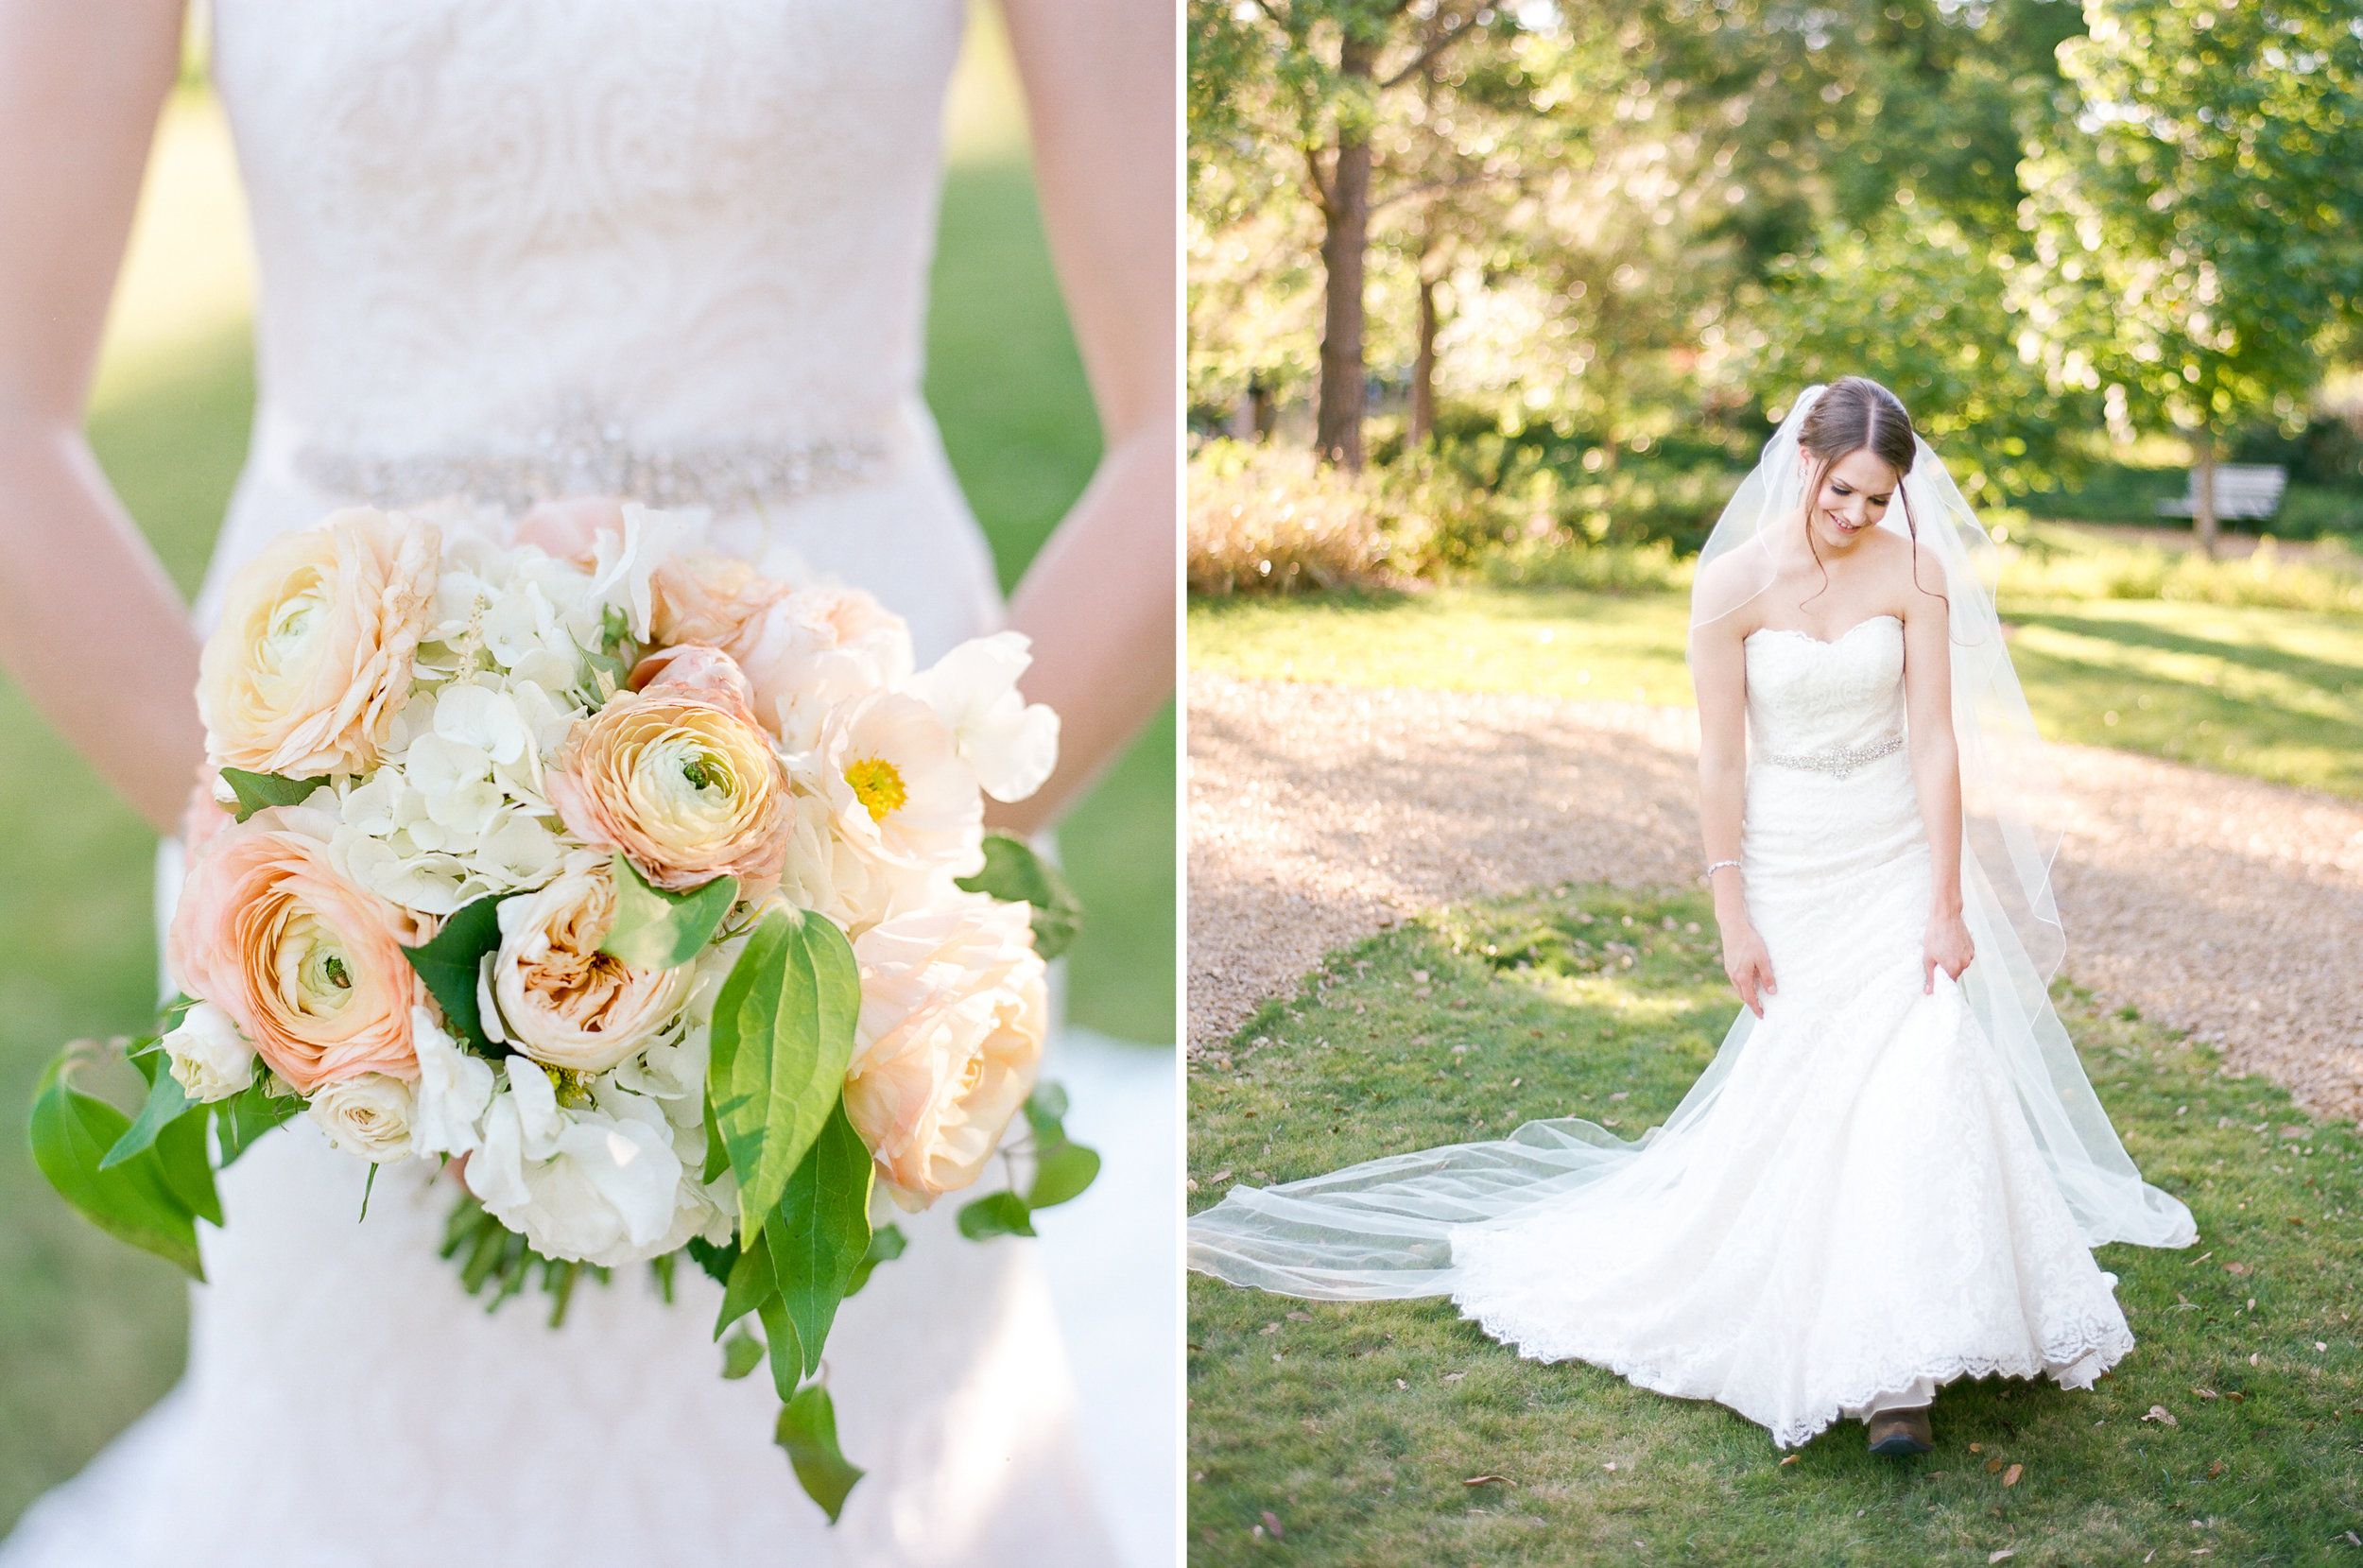 Houston-Wedding-Photographer-Film-Fine-Art-Bridals-Dana Fernandez-Photography-103.jpg